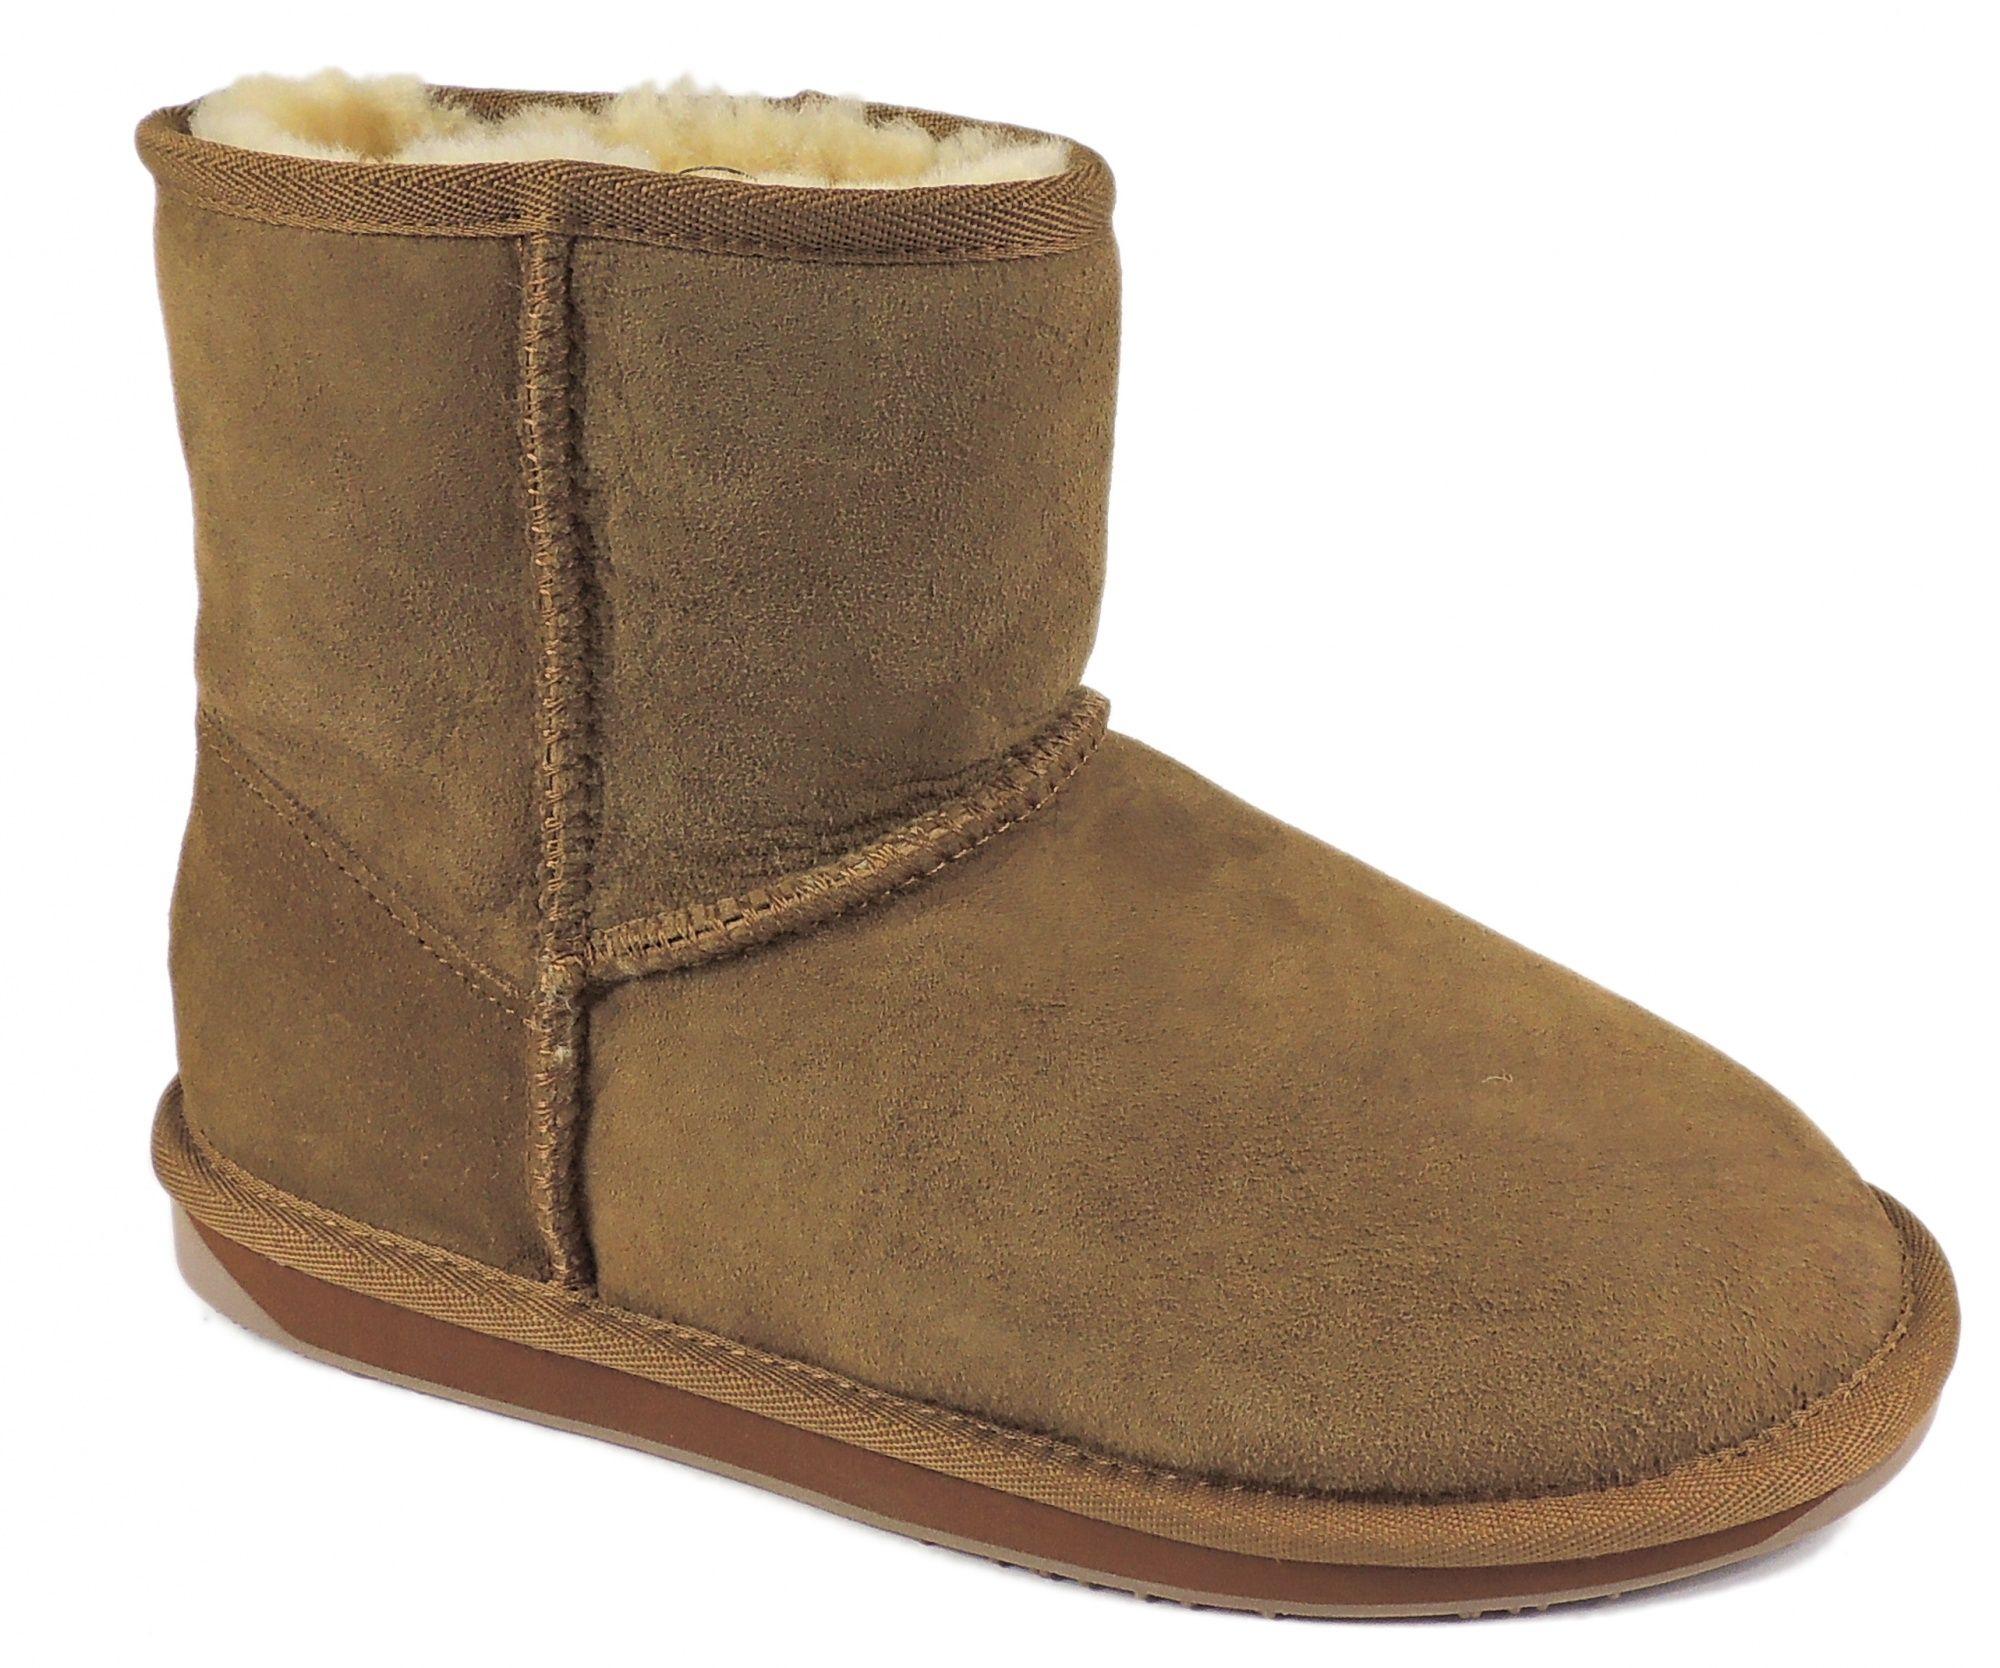 Botki Emu 3580103d Damskie Botki Intershoe Com Pl Boots Ugg Boots Shoes